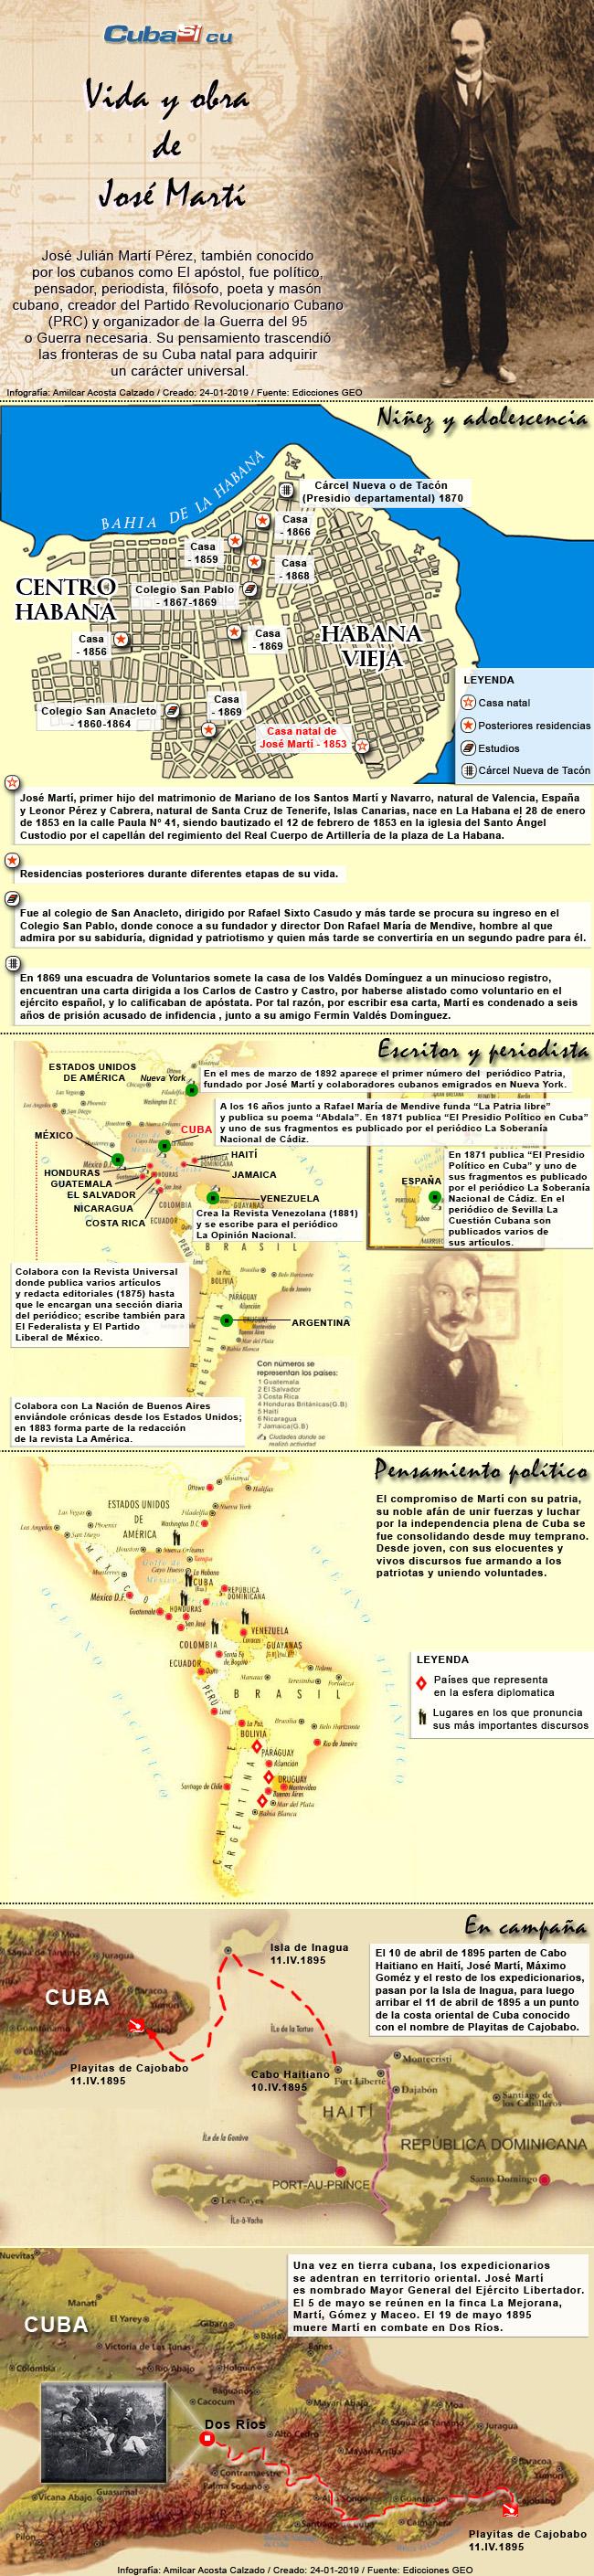 https://www.cubaperiodistas.cu/wp-content/uploads/2019/07/infografiajosemartividayobra.jpg